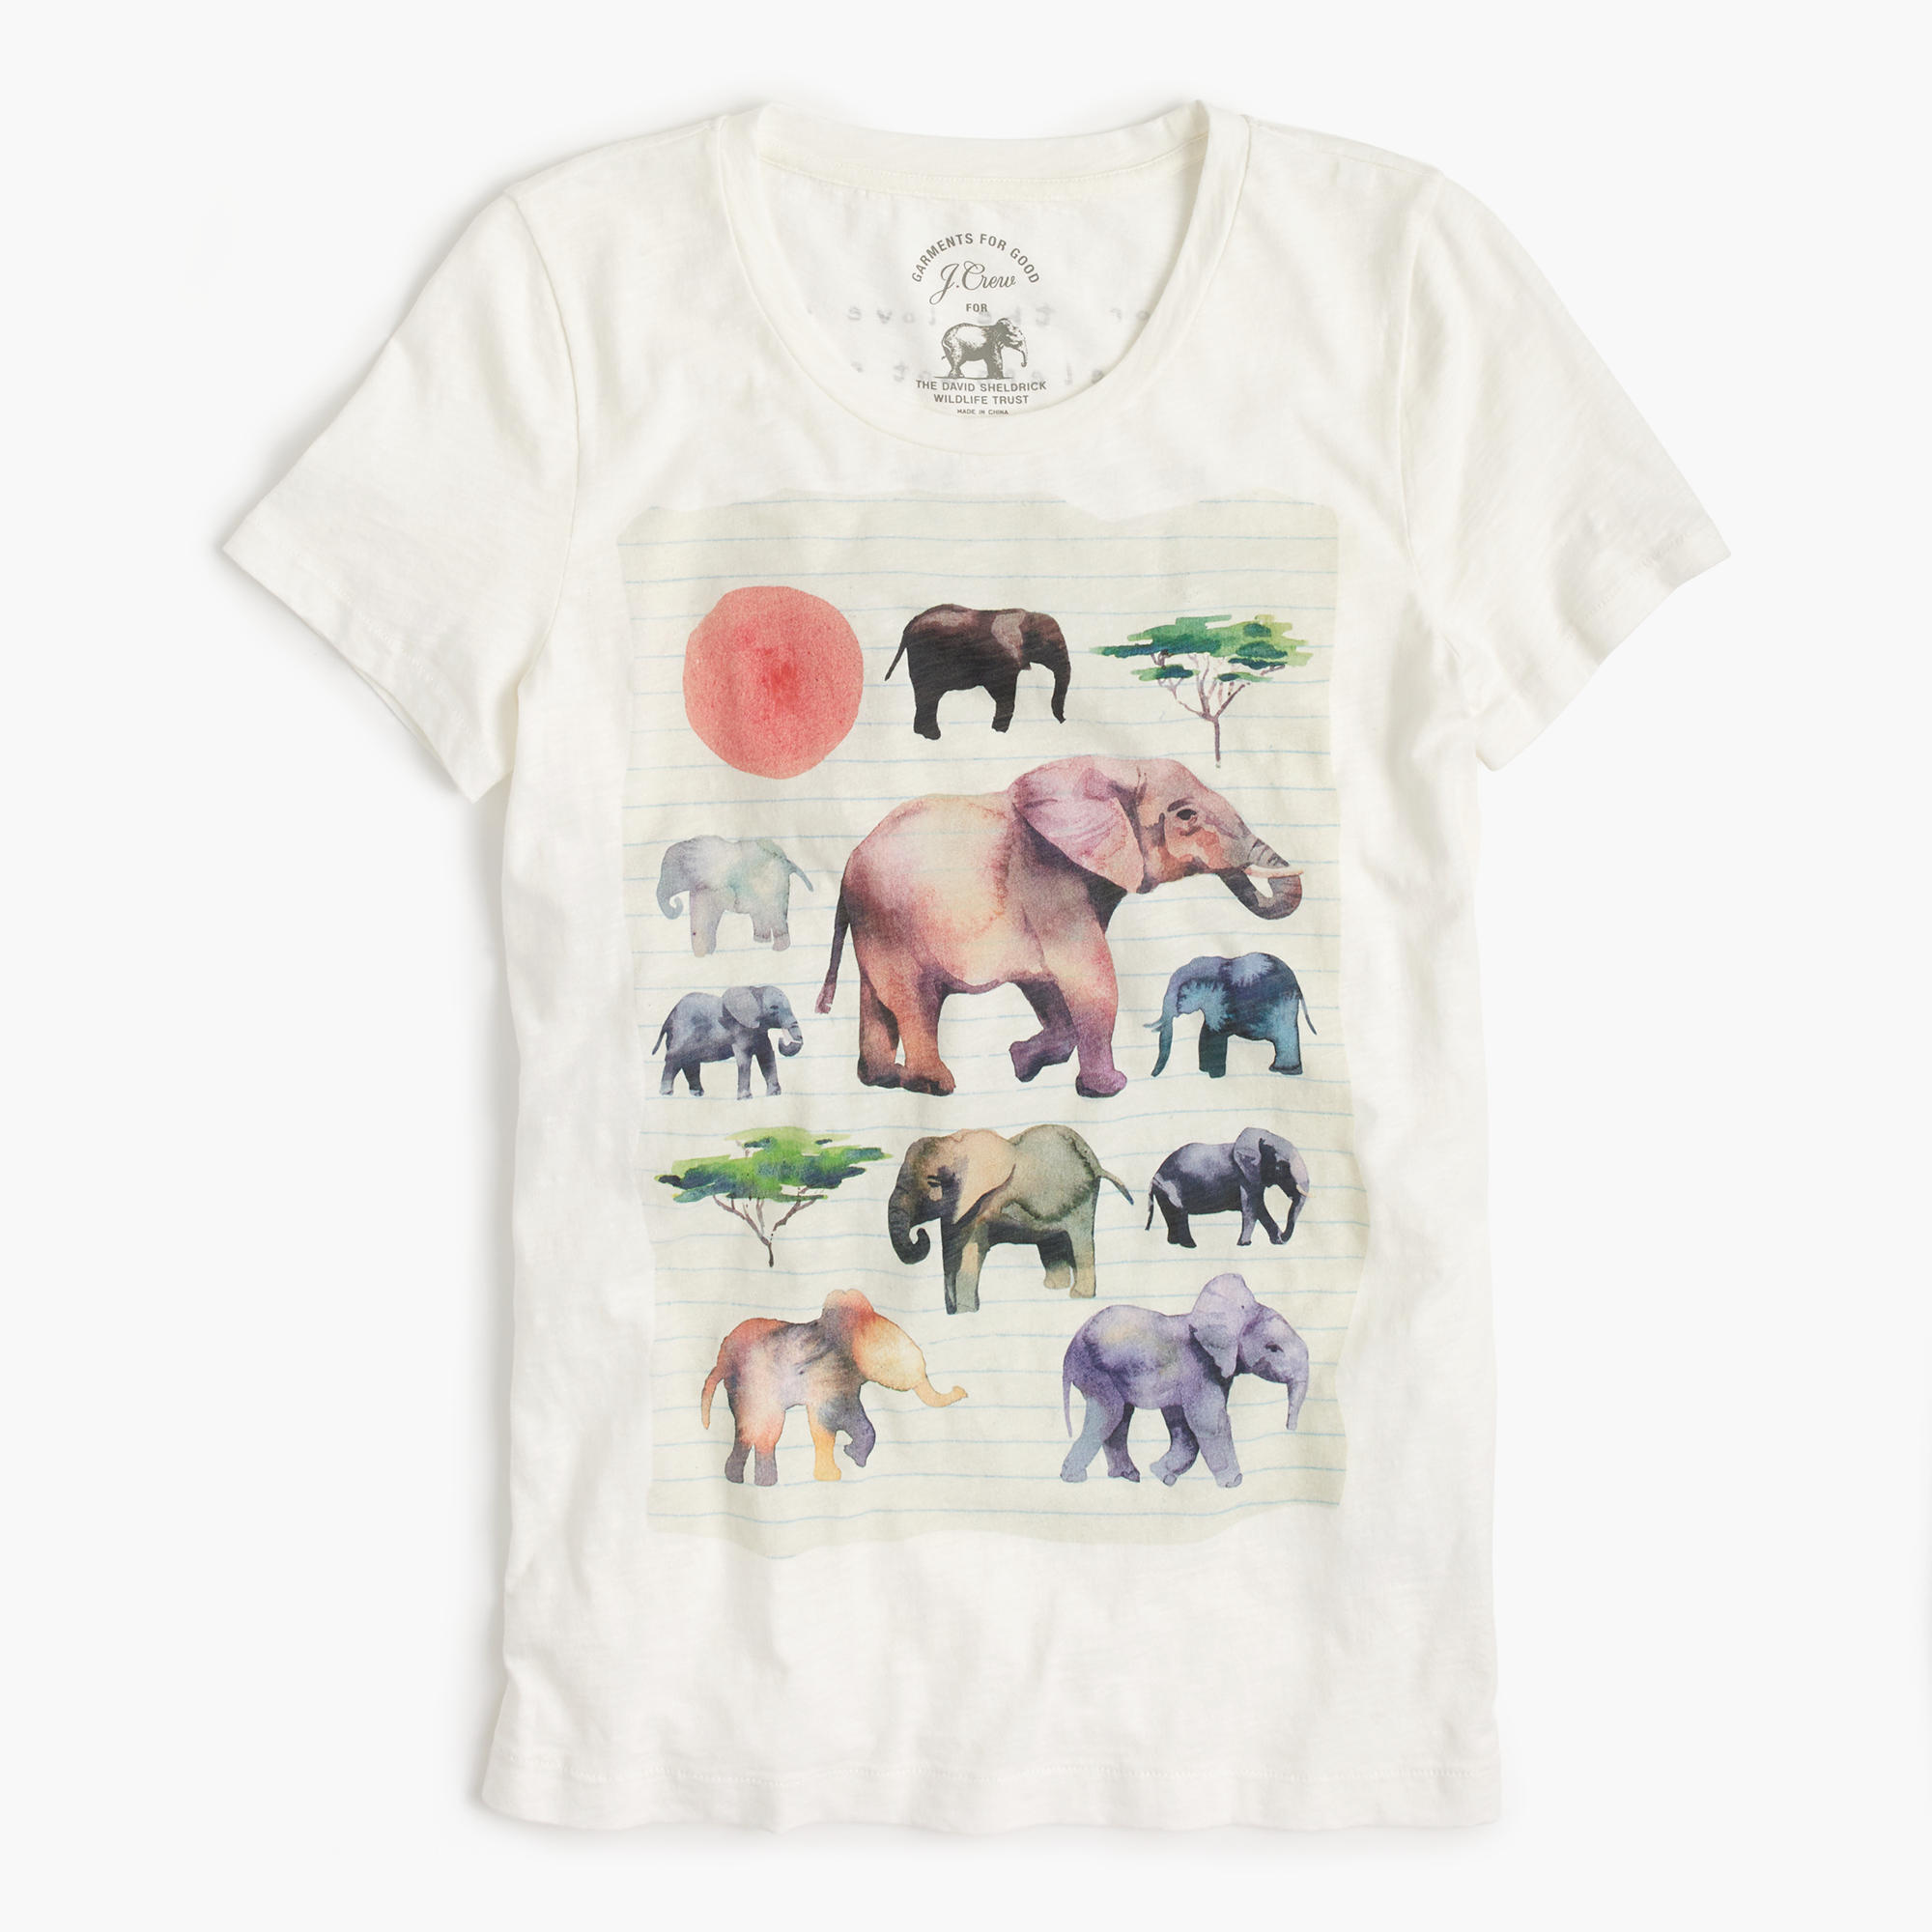 J crew for david sheldrick wildlife trust elephant t shirt for Elephant t shirt women s